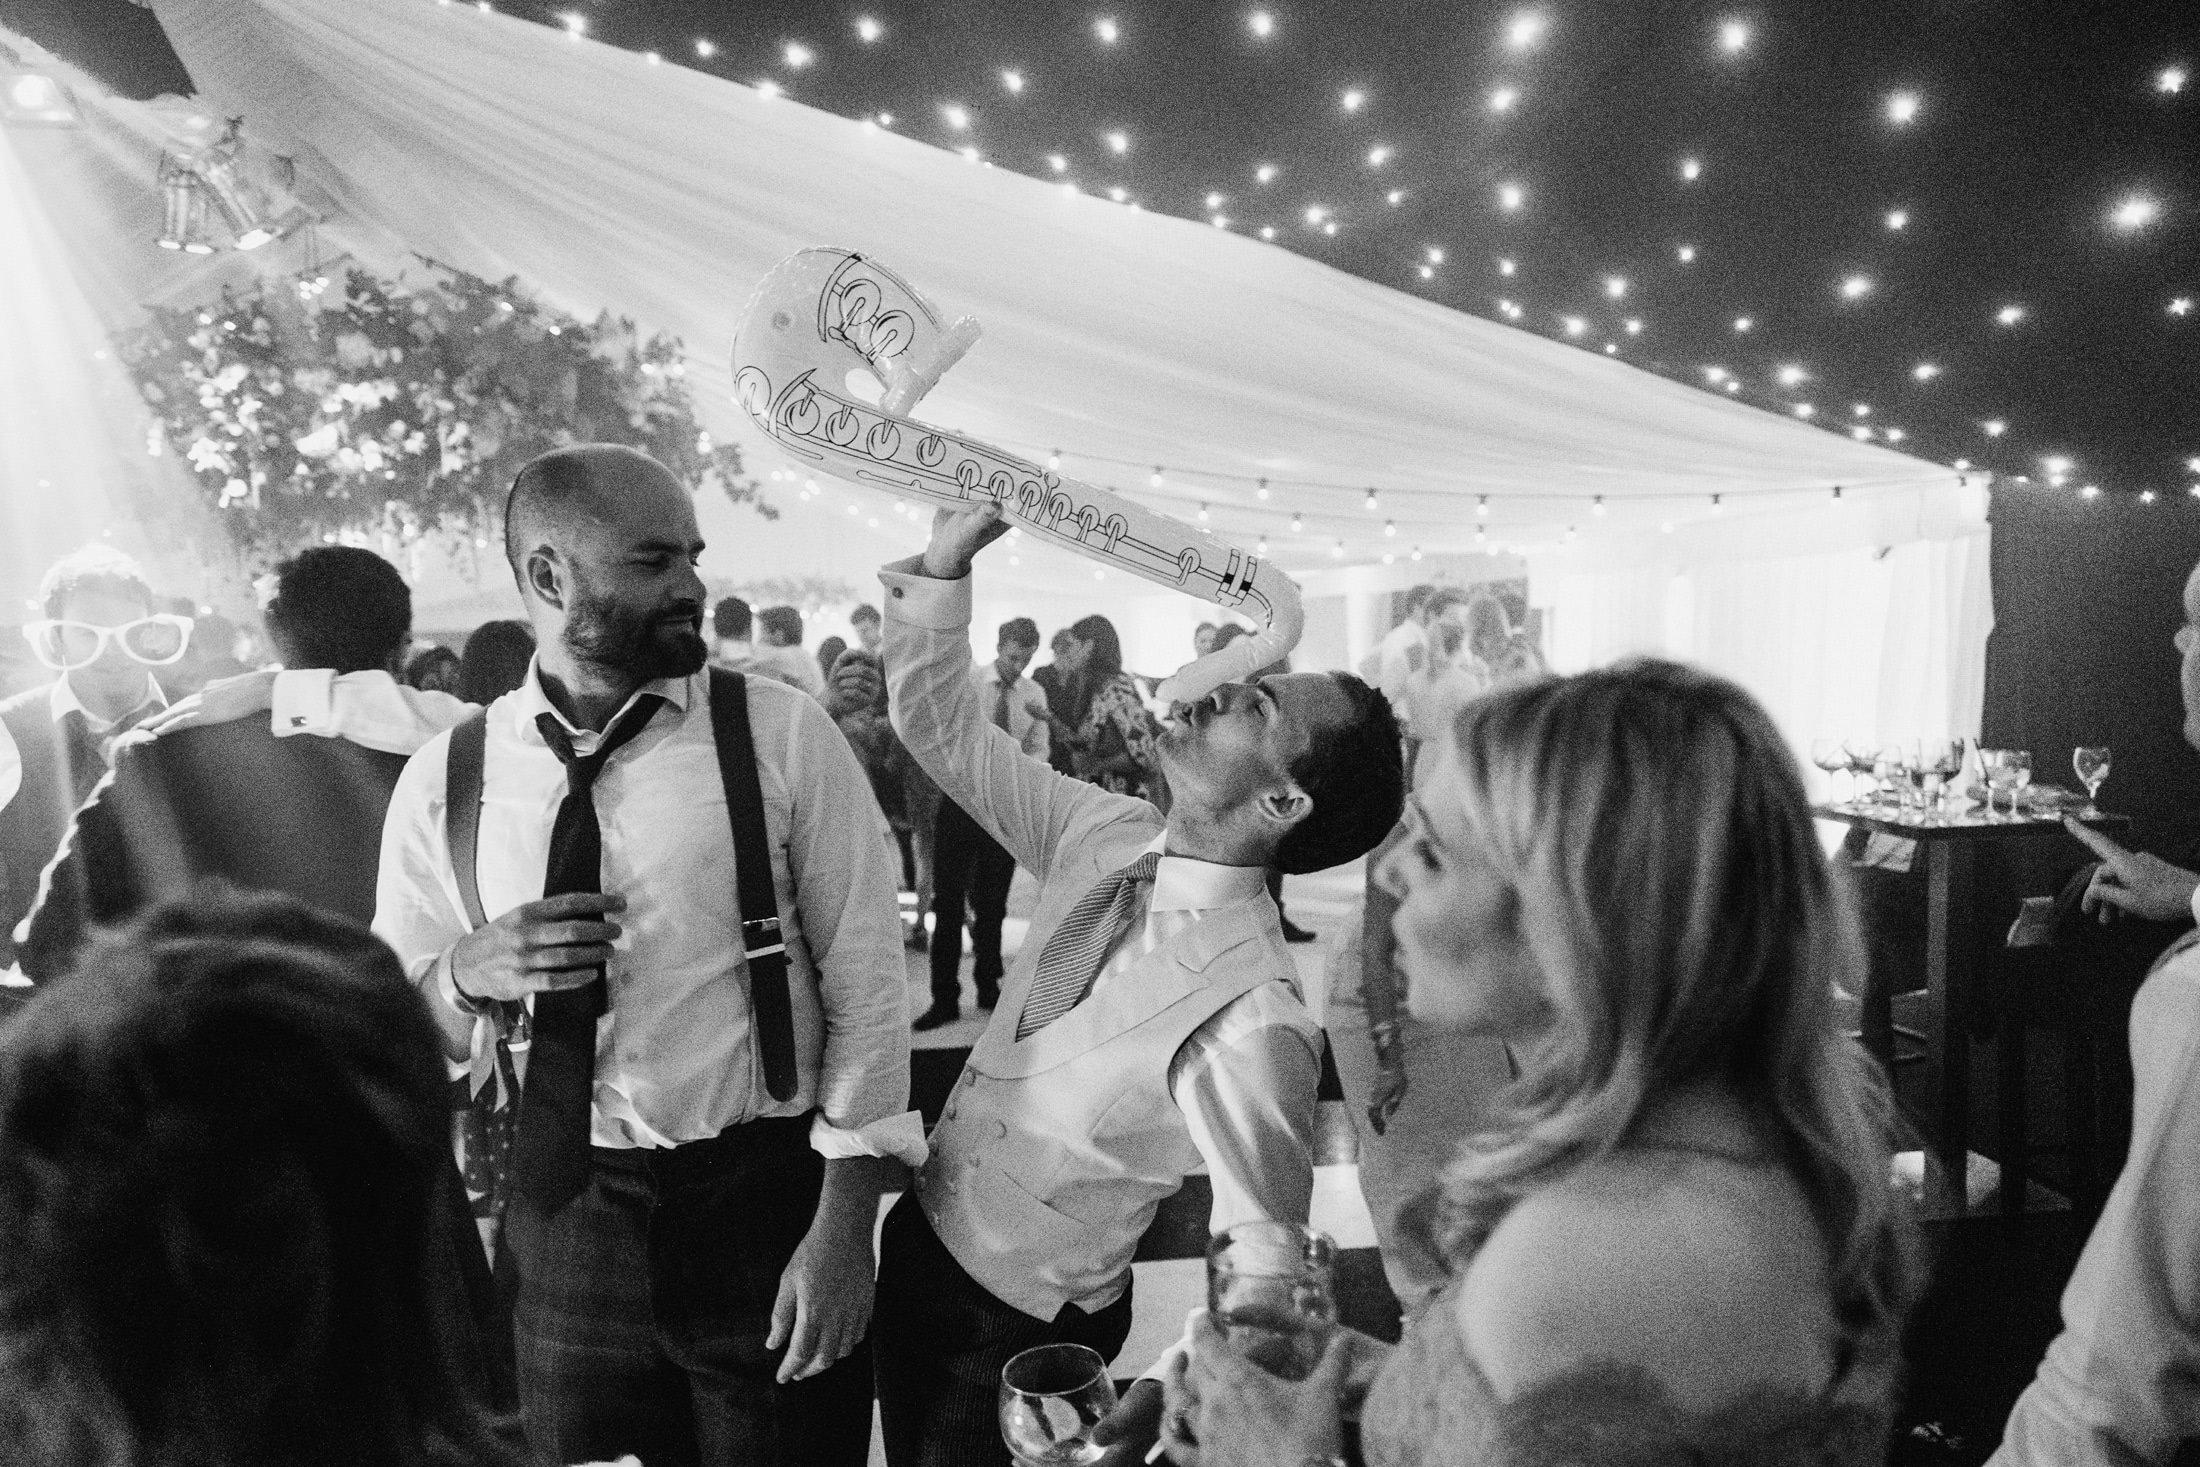 wedding guest on dance floor with blow up instruments